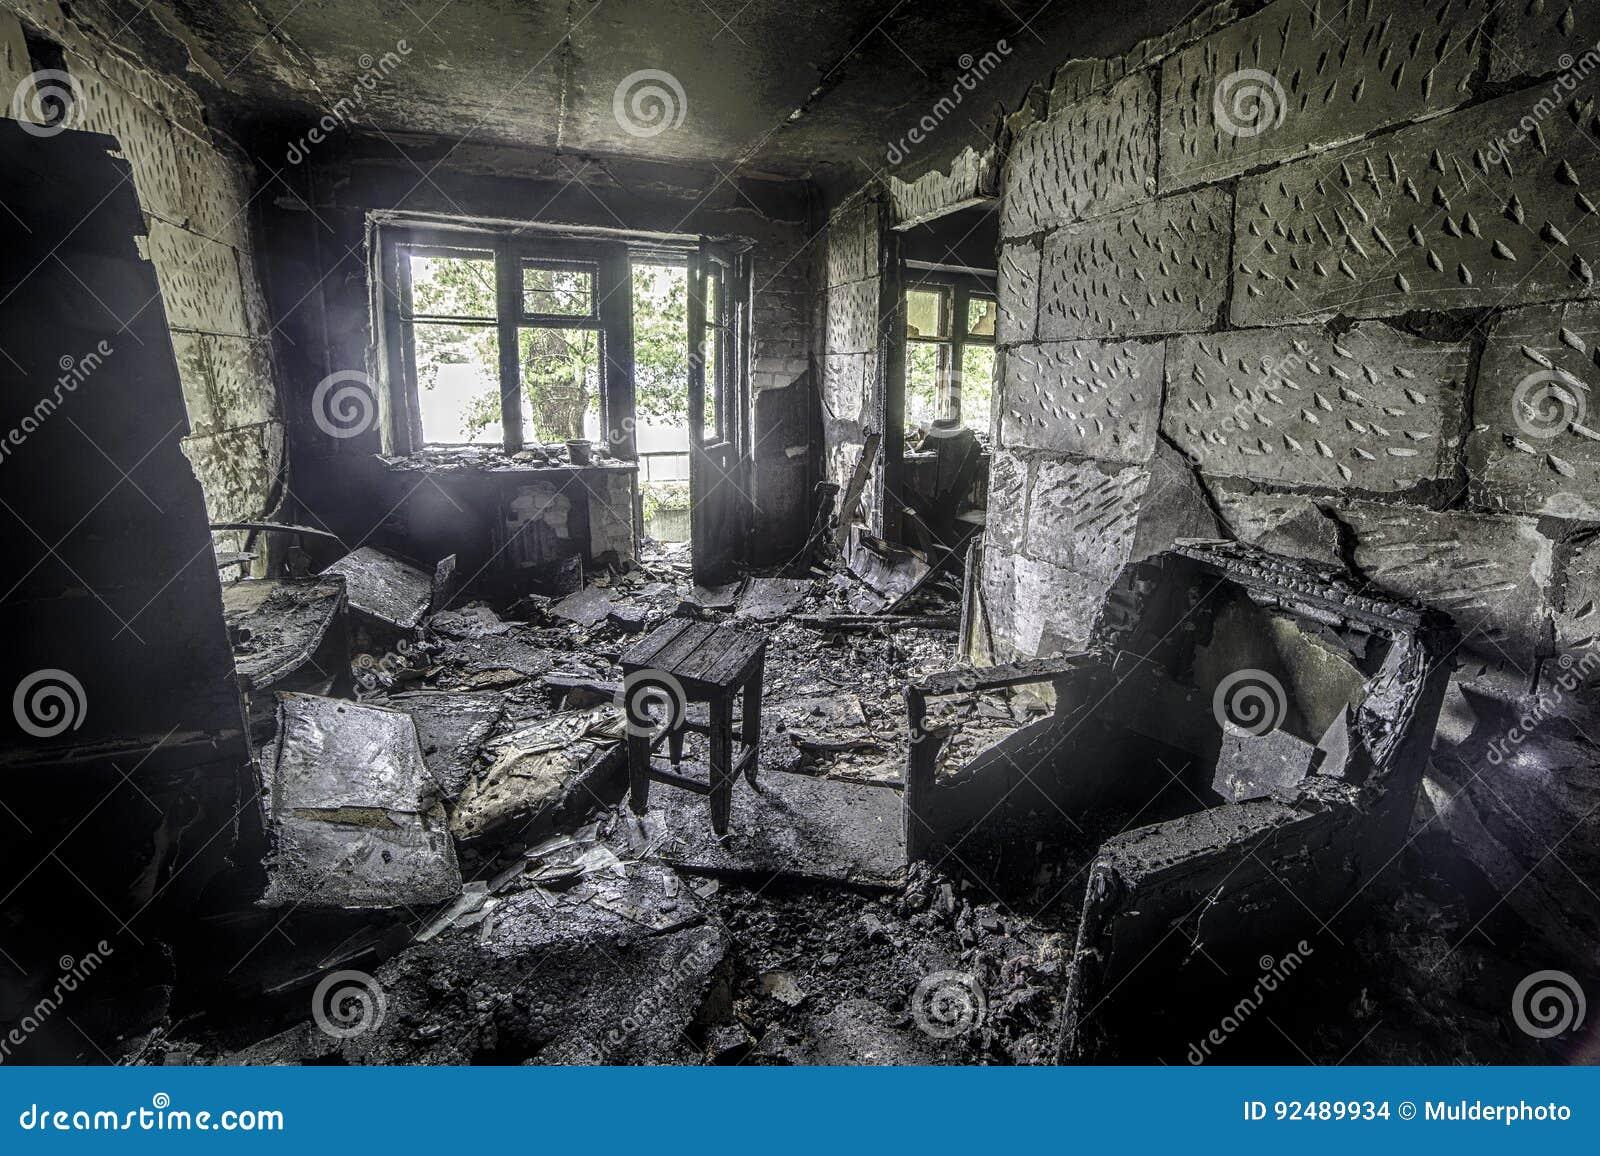 Muebles las quemadas obtenga ideas dise o de muebles for Muebles cantero lucena